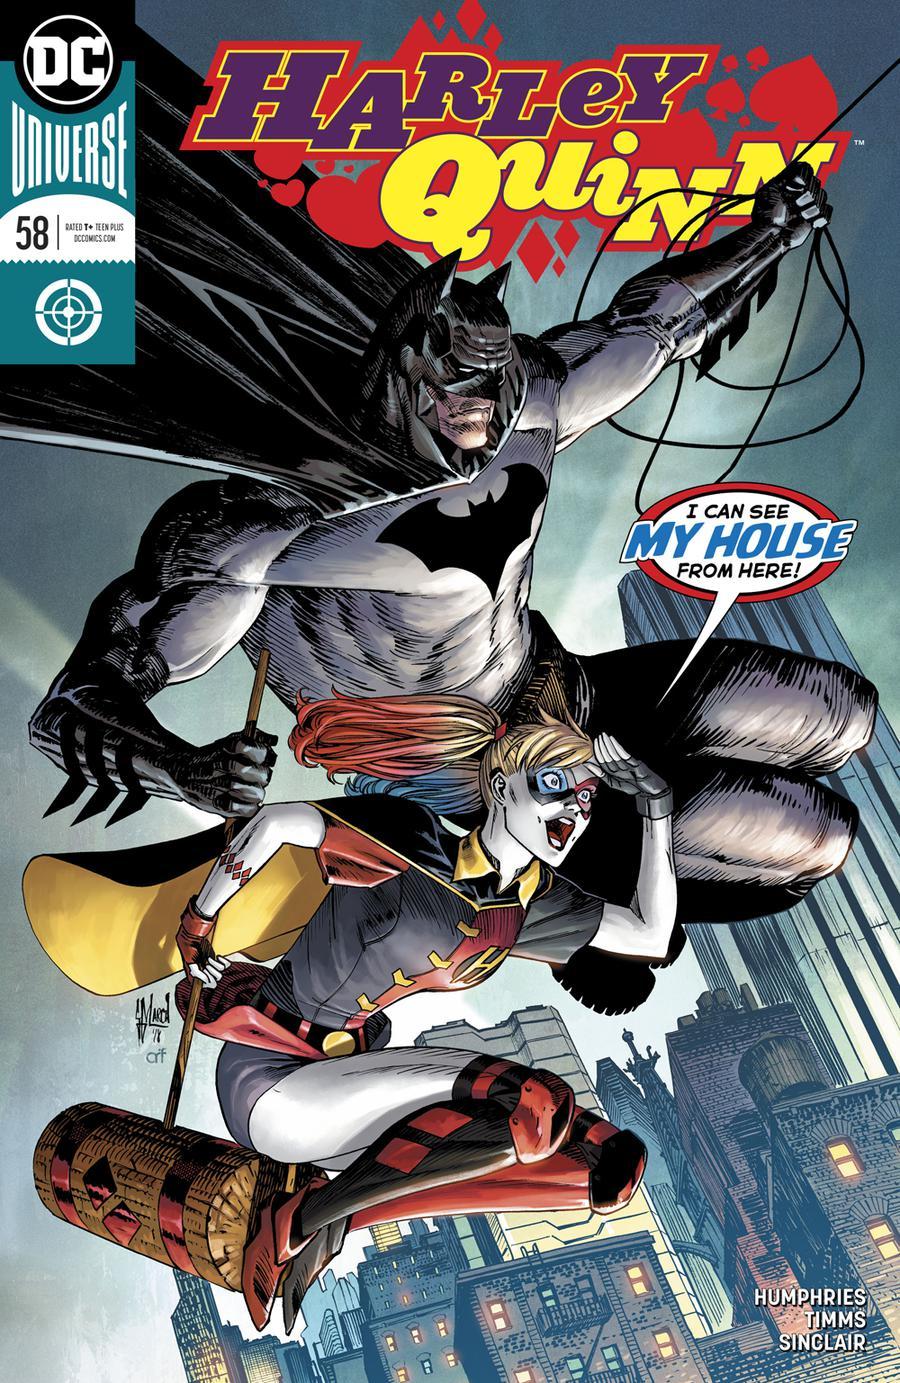 Harley Quinn Vol 3 #58 Cover A Regular Guillem March Cover